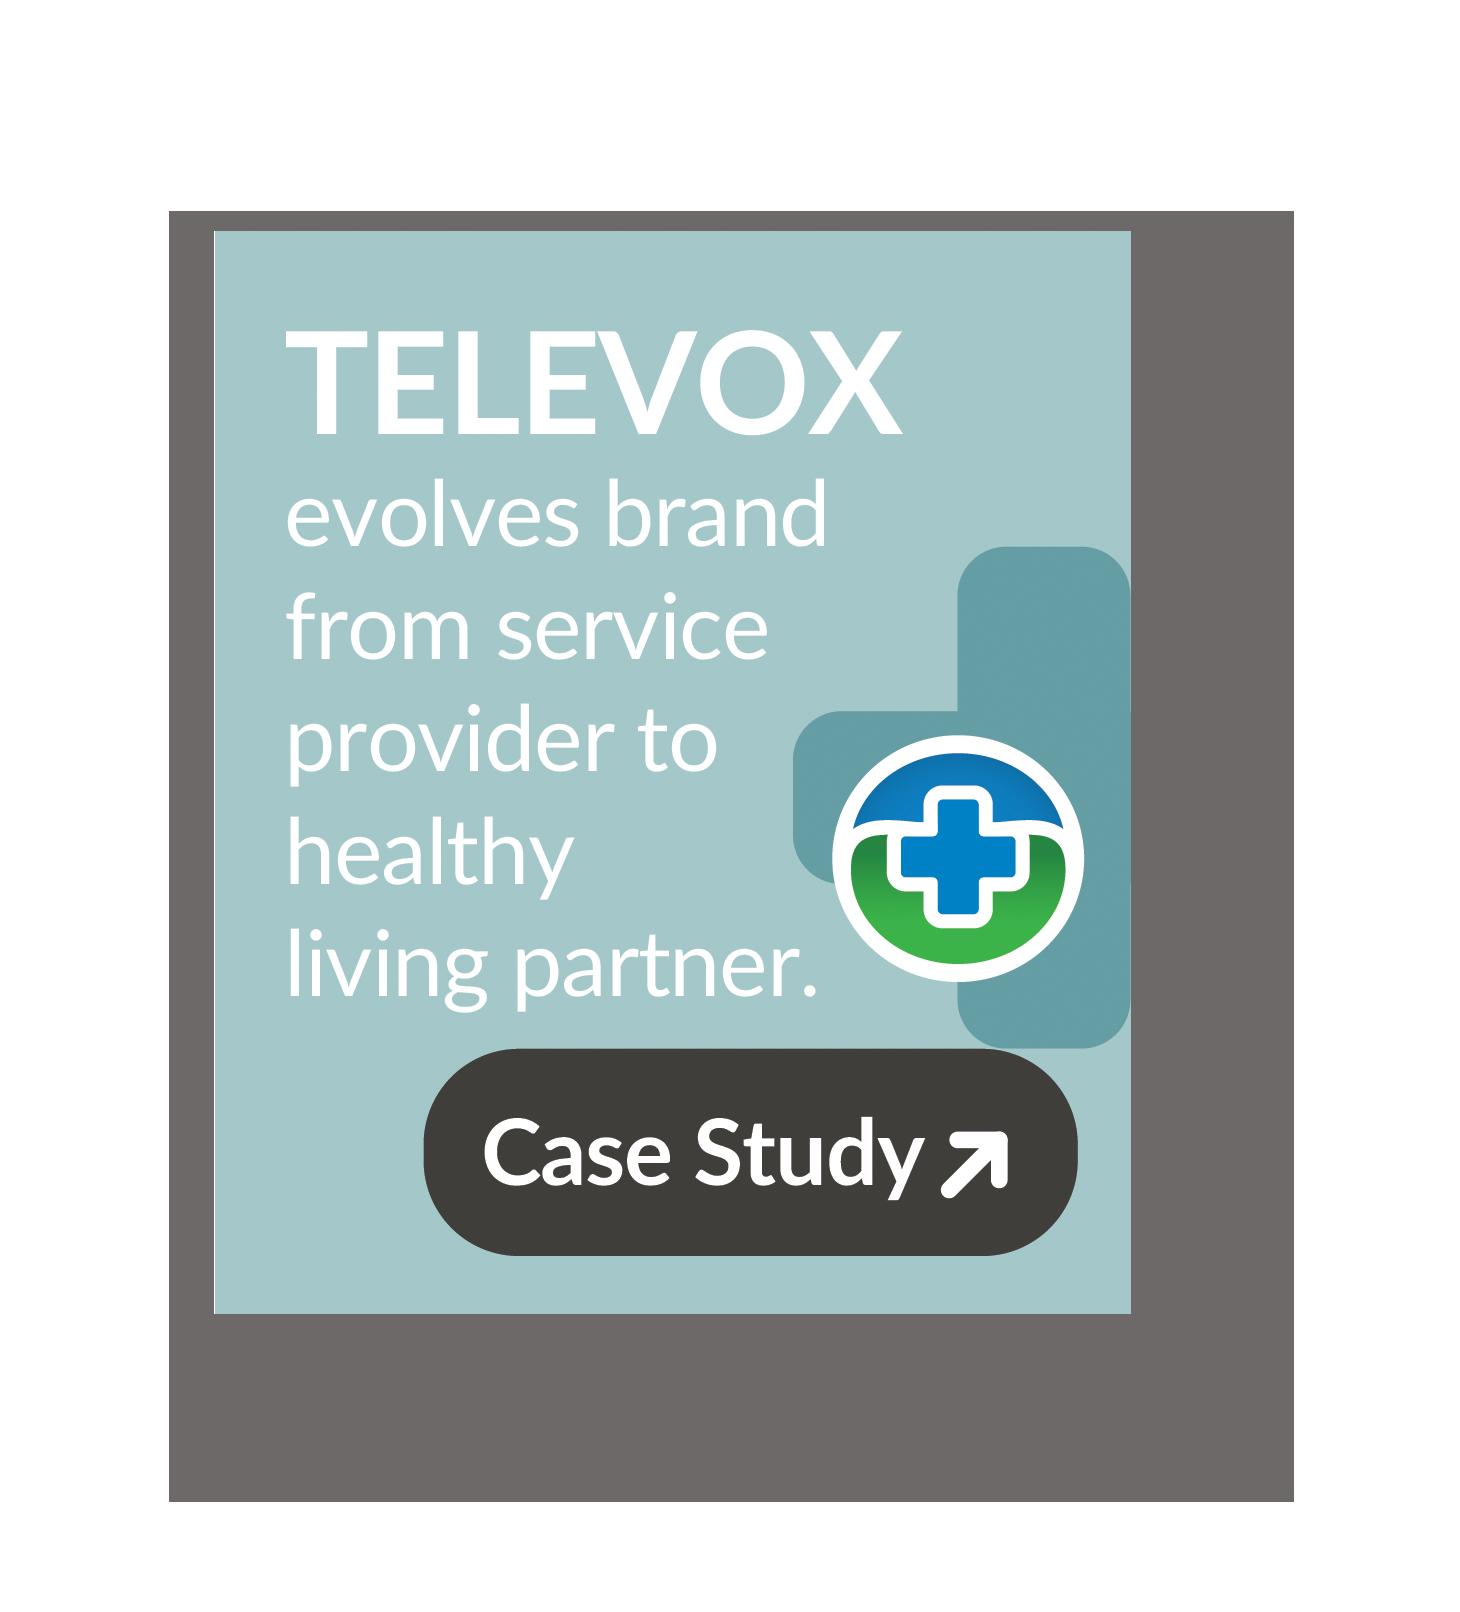 Case Study: TeleVox